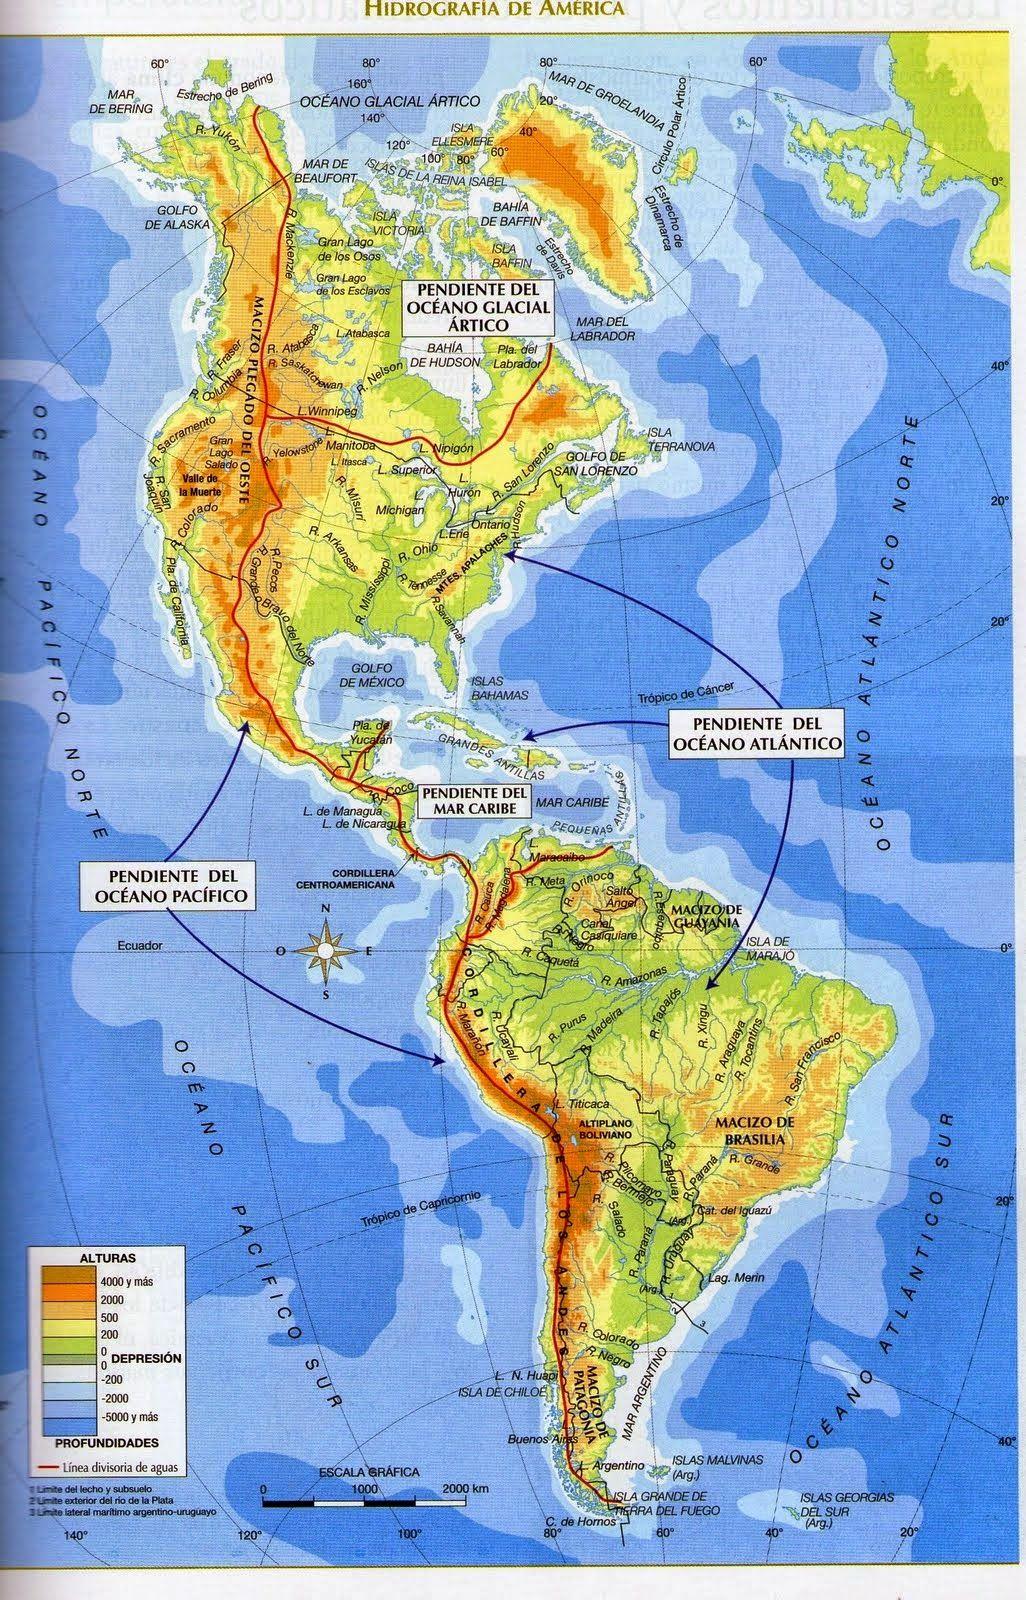 Mapa Hidrografico De España.Mapa Hidrografico De America Completo In Em 2019 Mapa